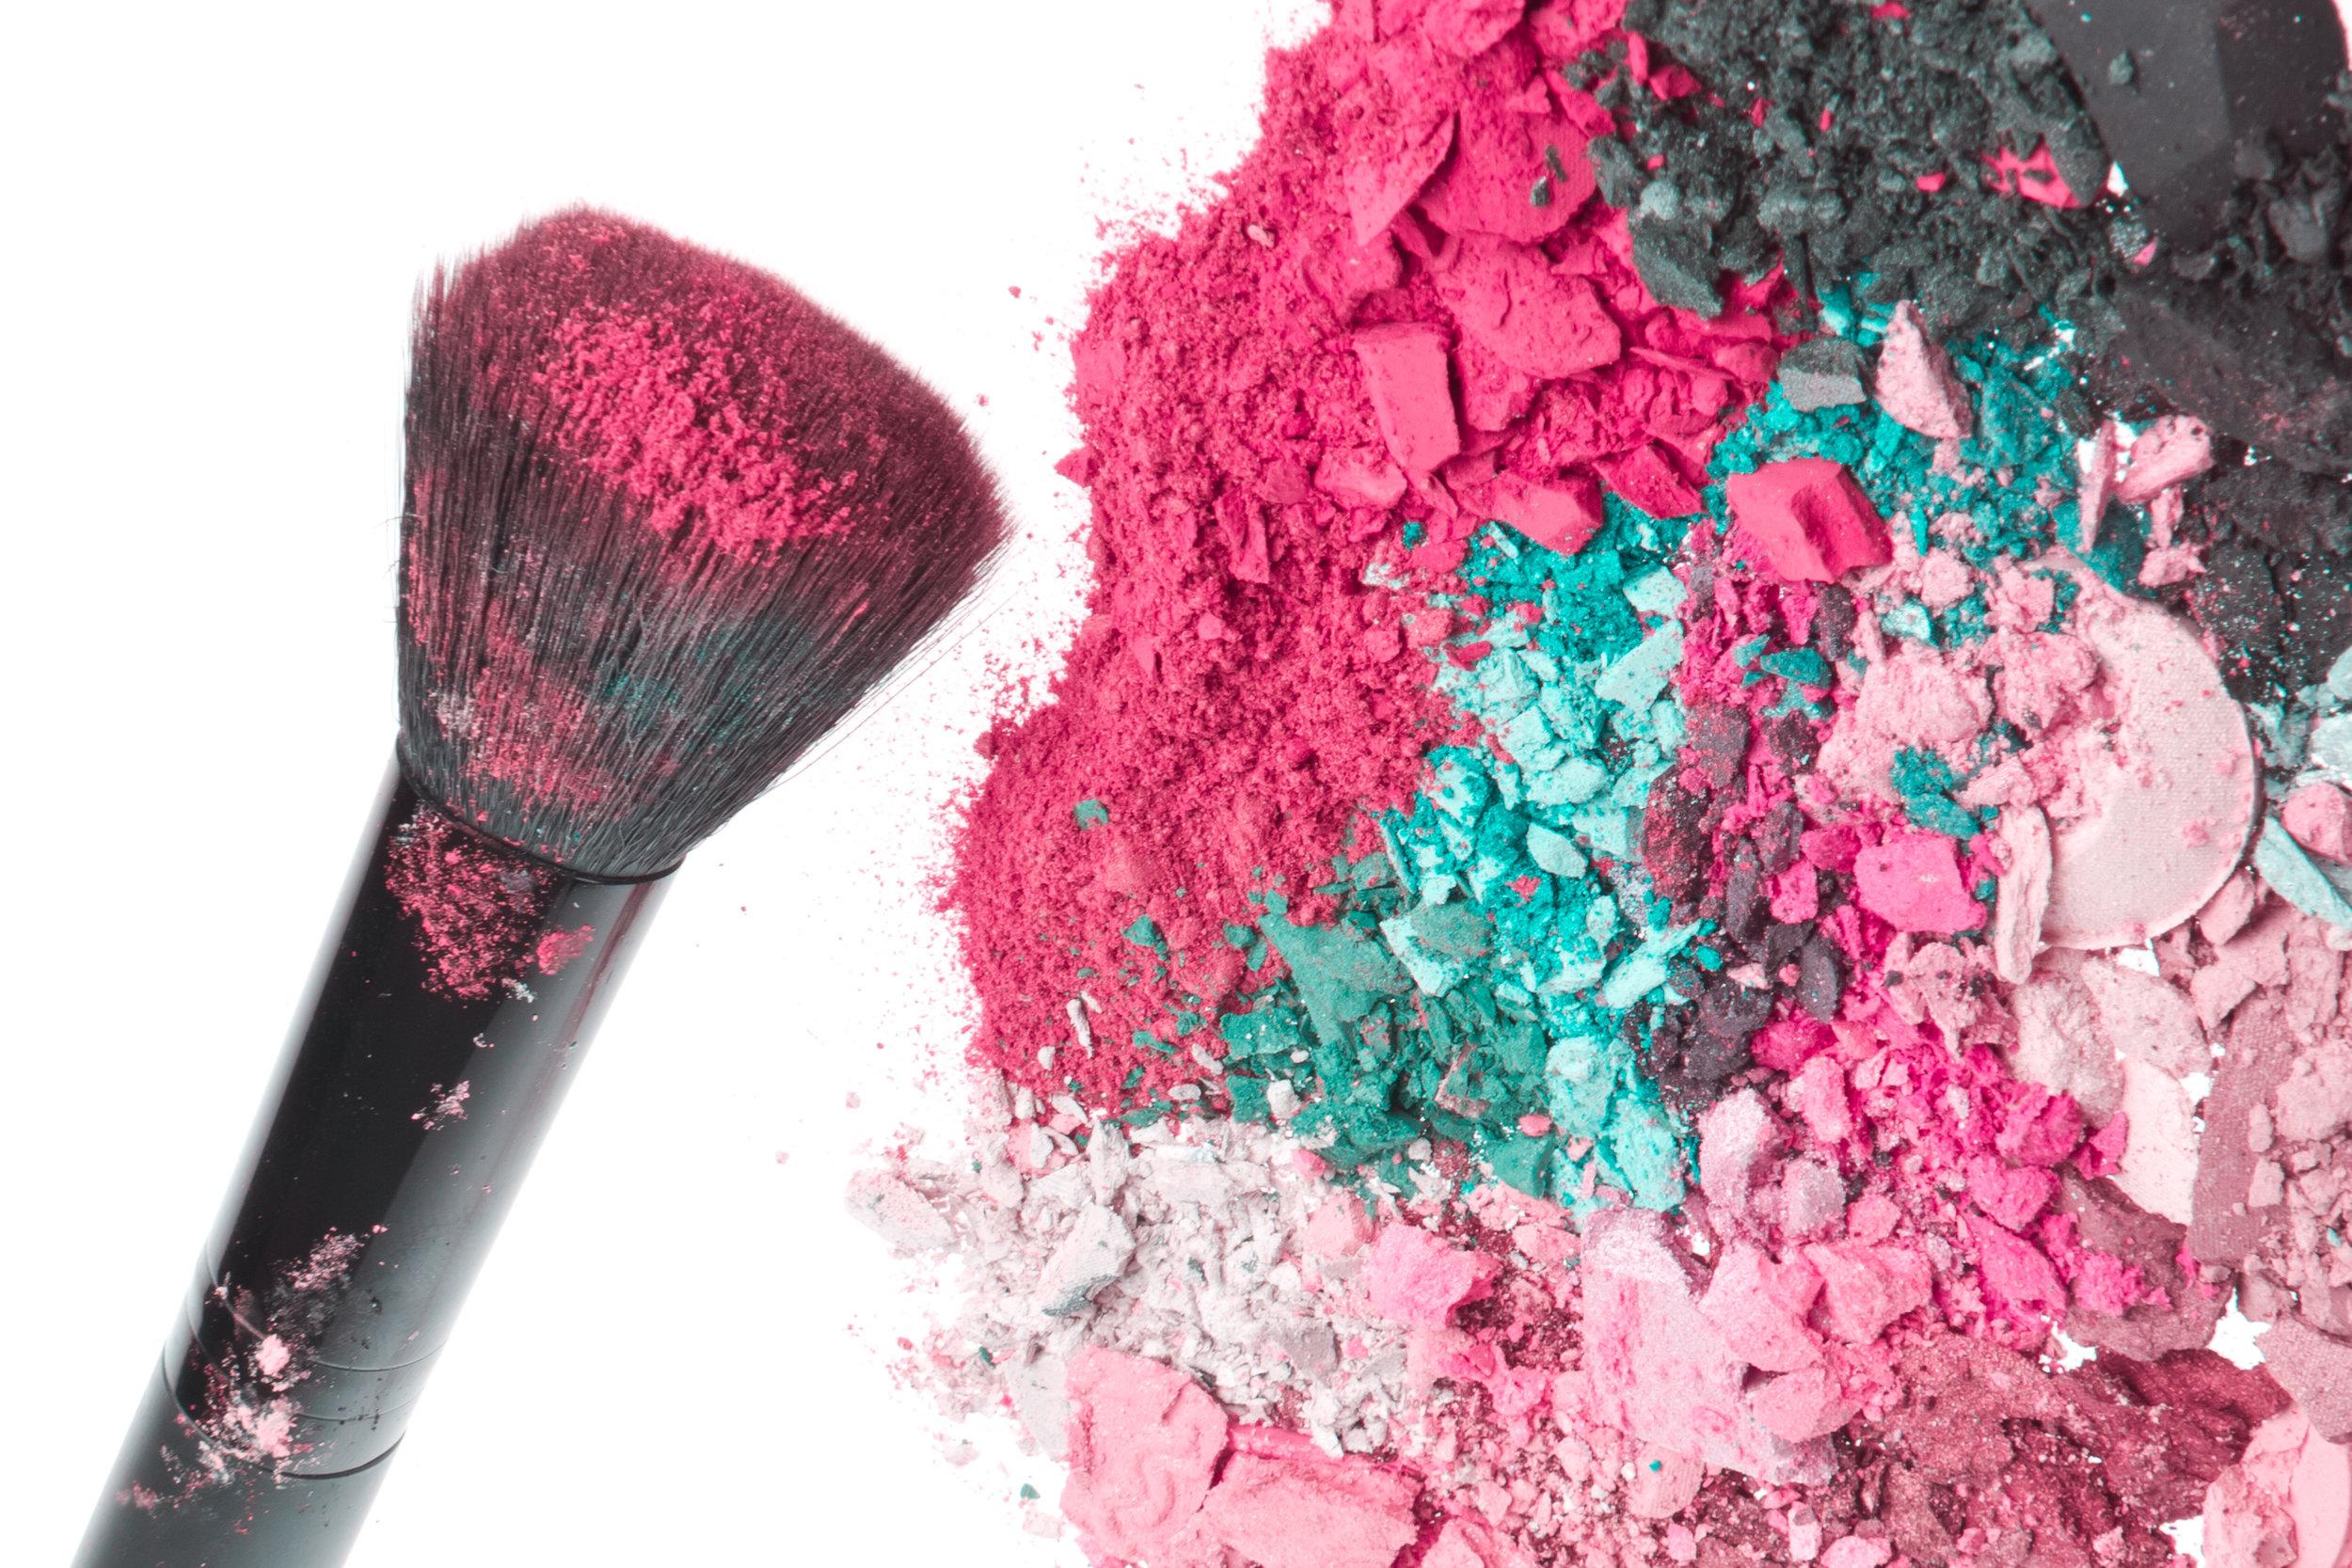 bigstock-crushed-eyeshadows-with-brush--65095159.jpg